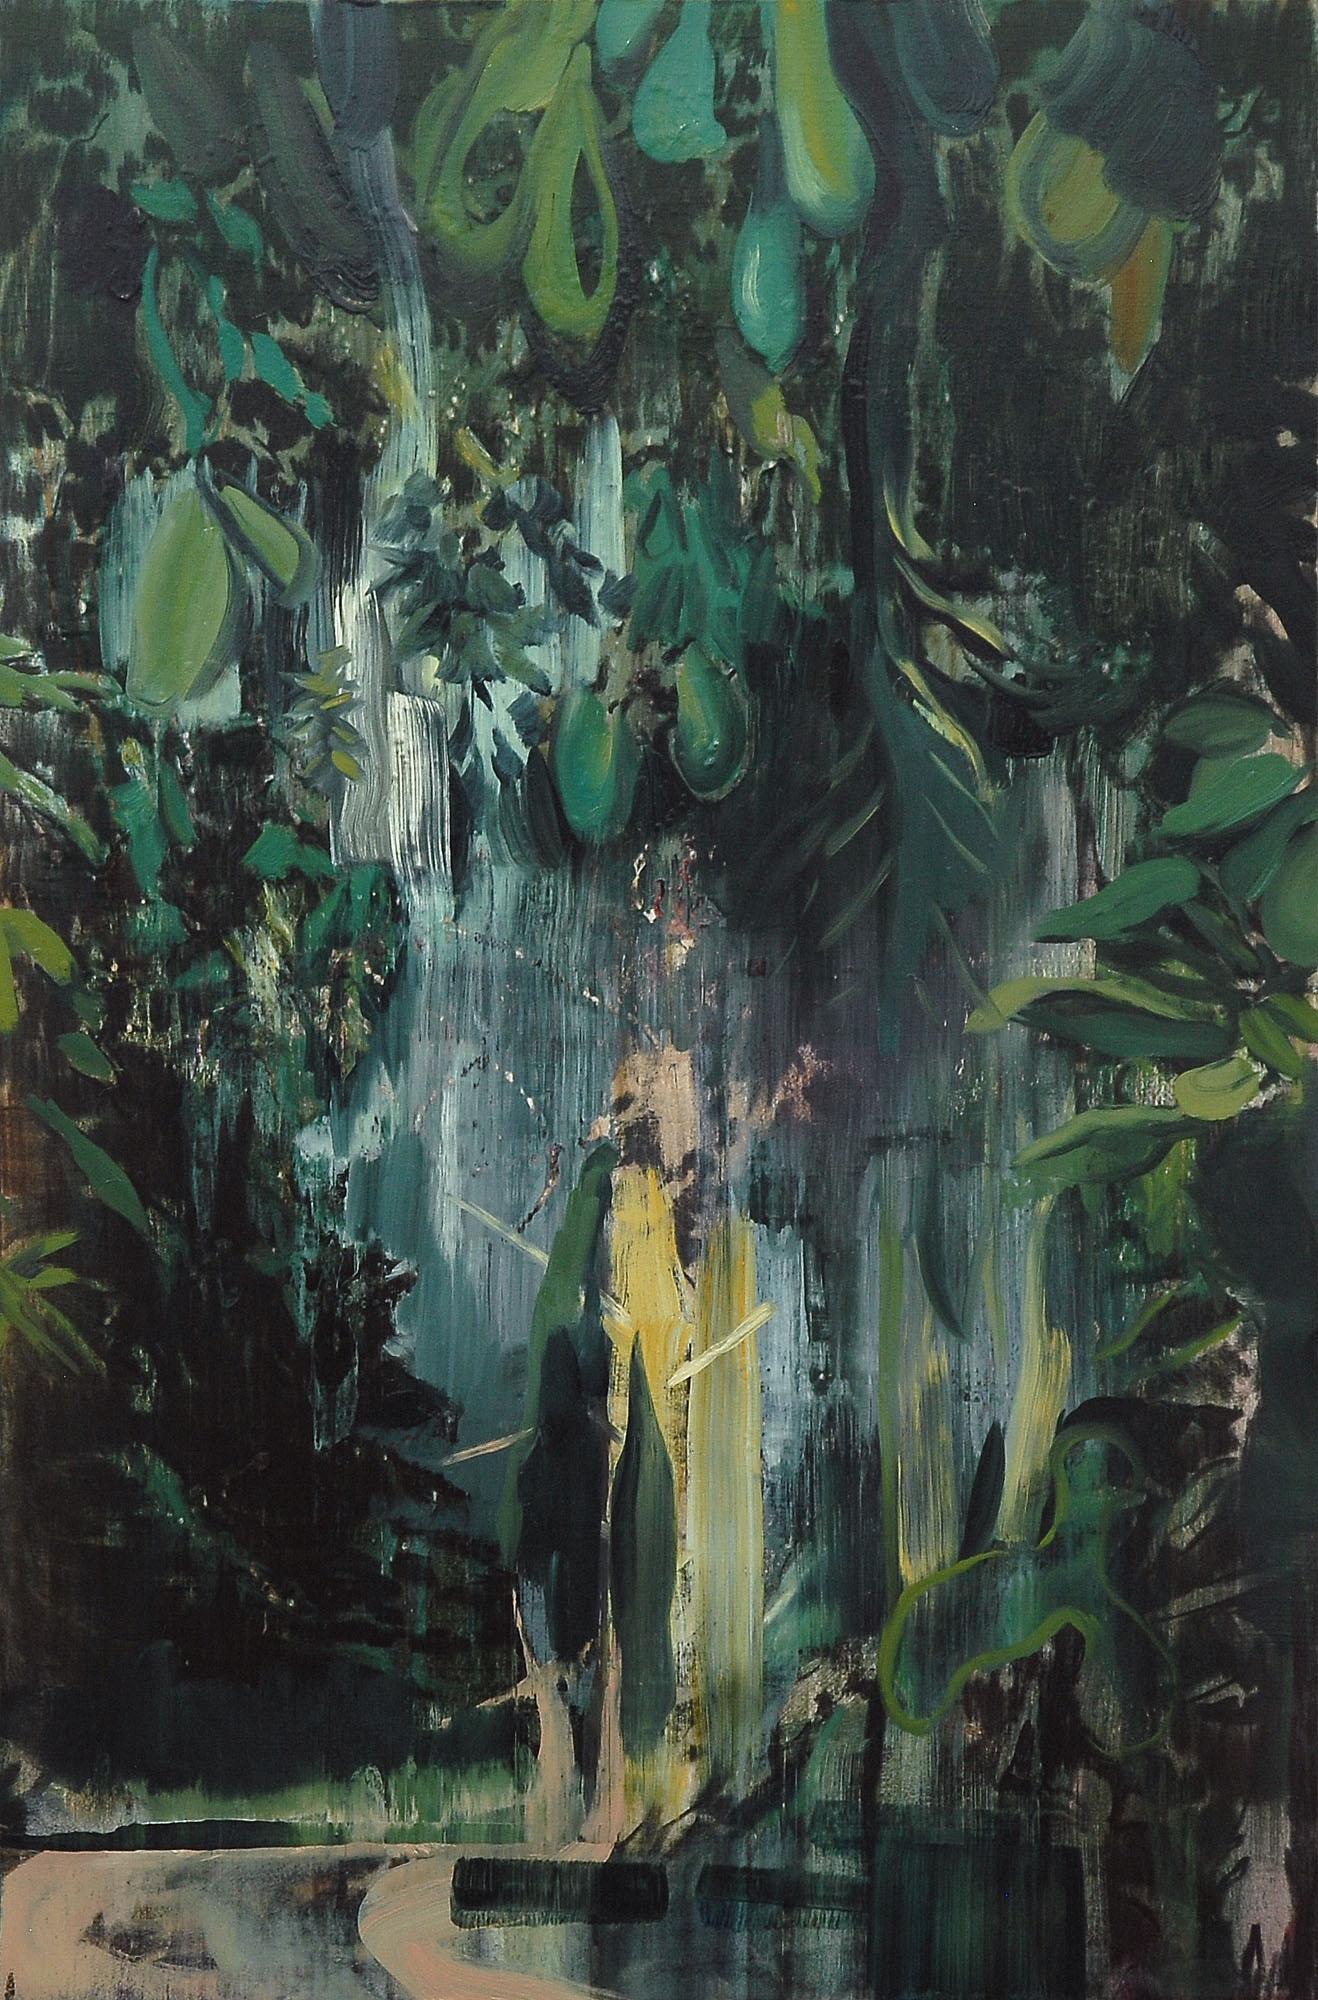 Lu Song 吕松, Through the Woods, 2015, Oil on canvas 布面油画, 120 x 80 cm